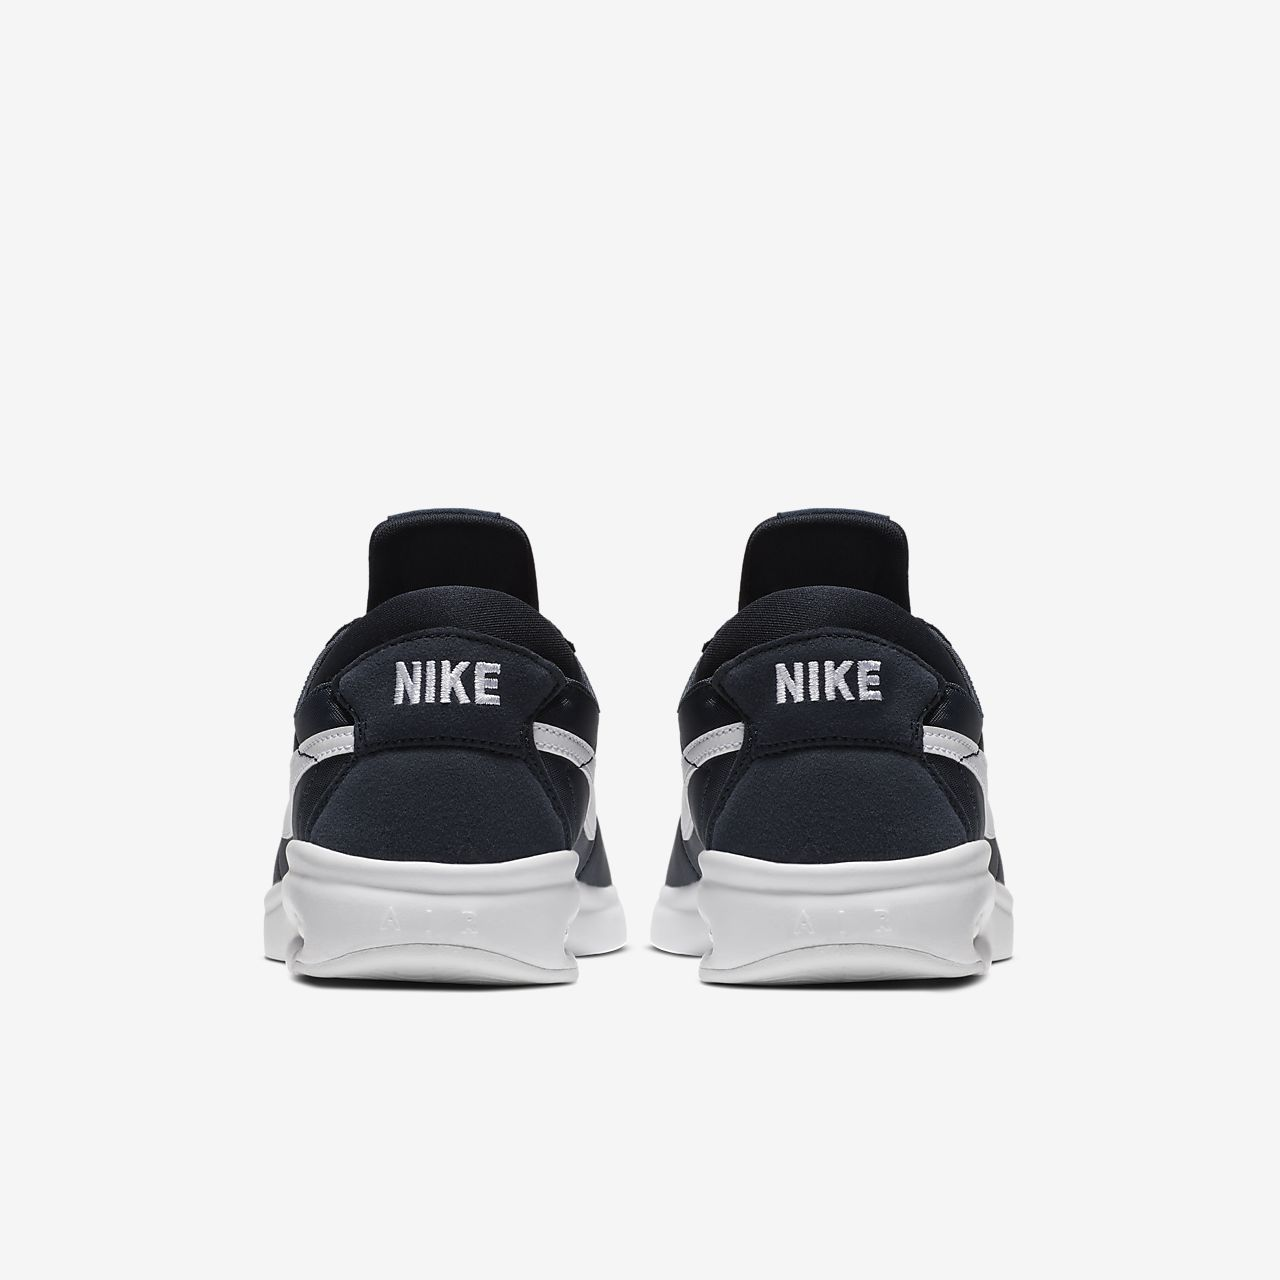 nike sb air max bruin vapor men's skateboarding shoe